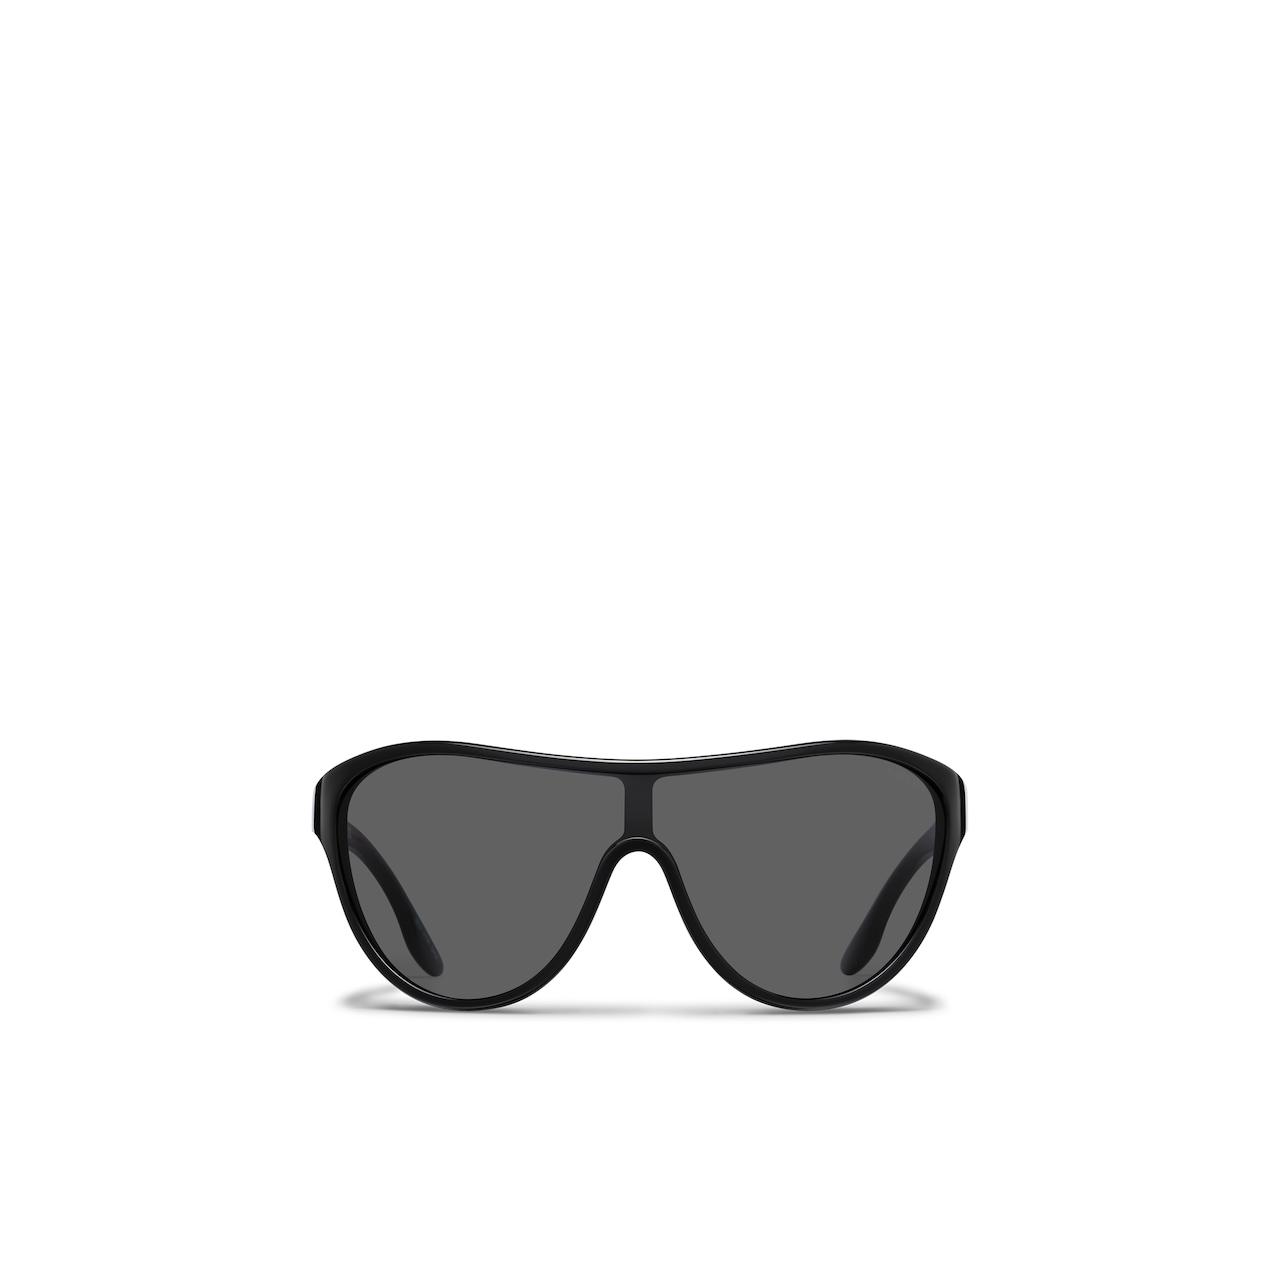 Prada Eyewear-Sonnenbrillen-Kollektion